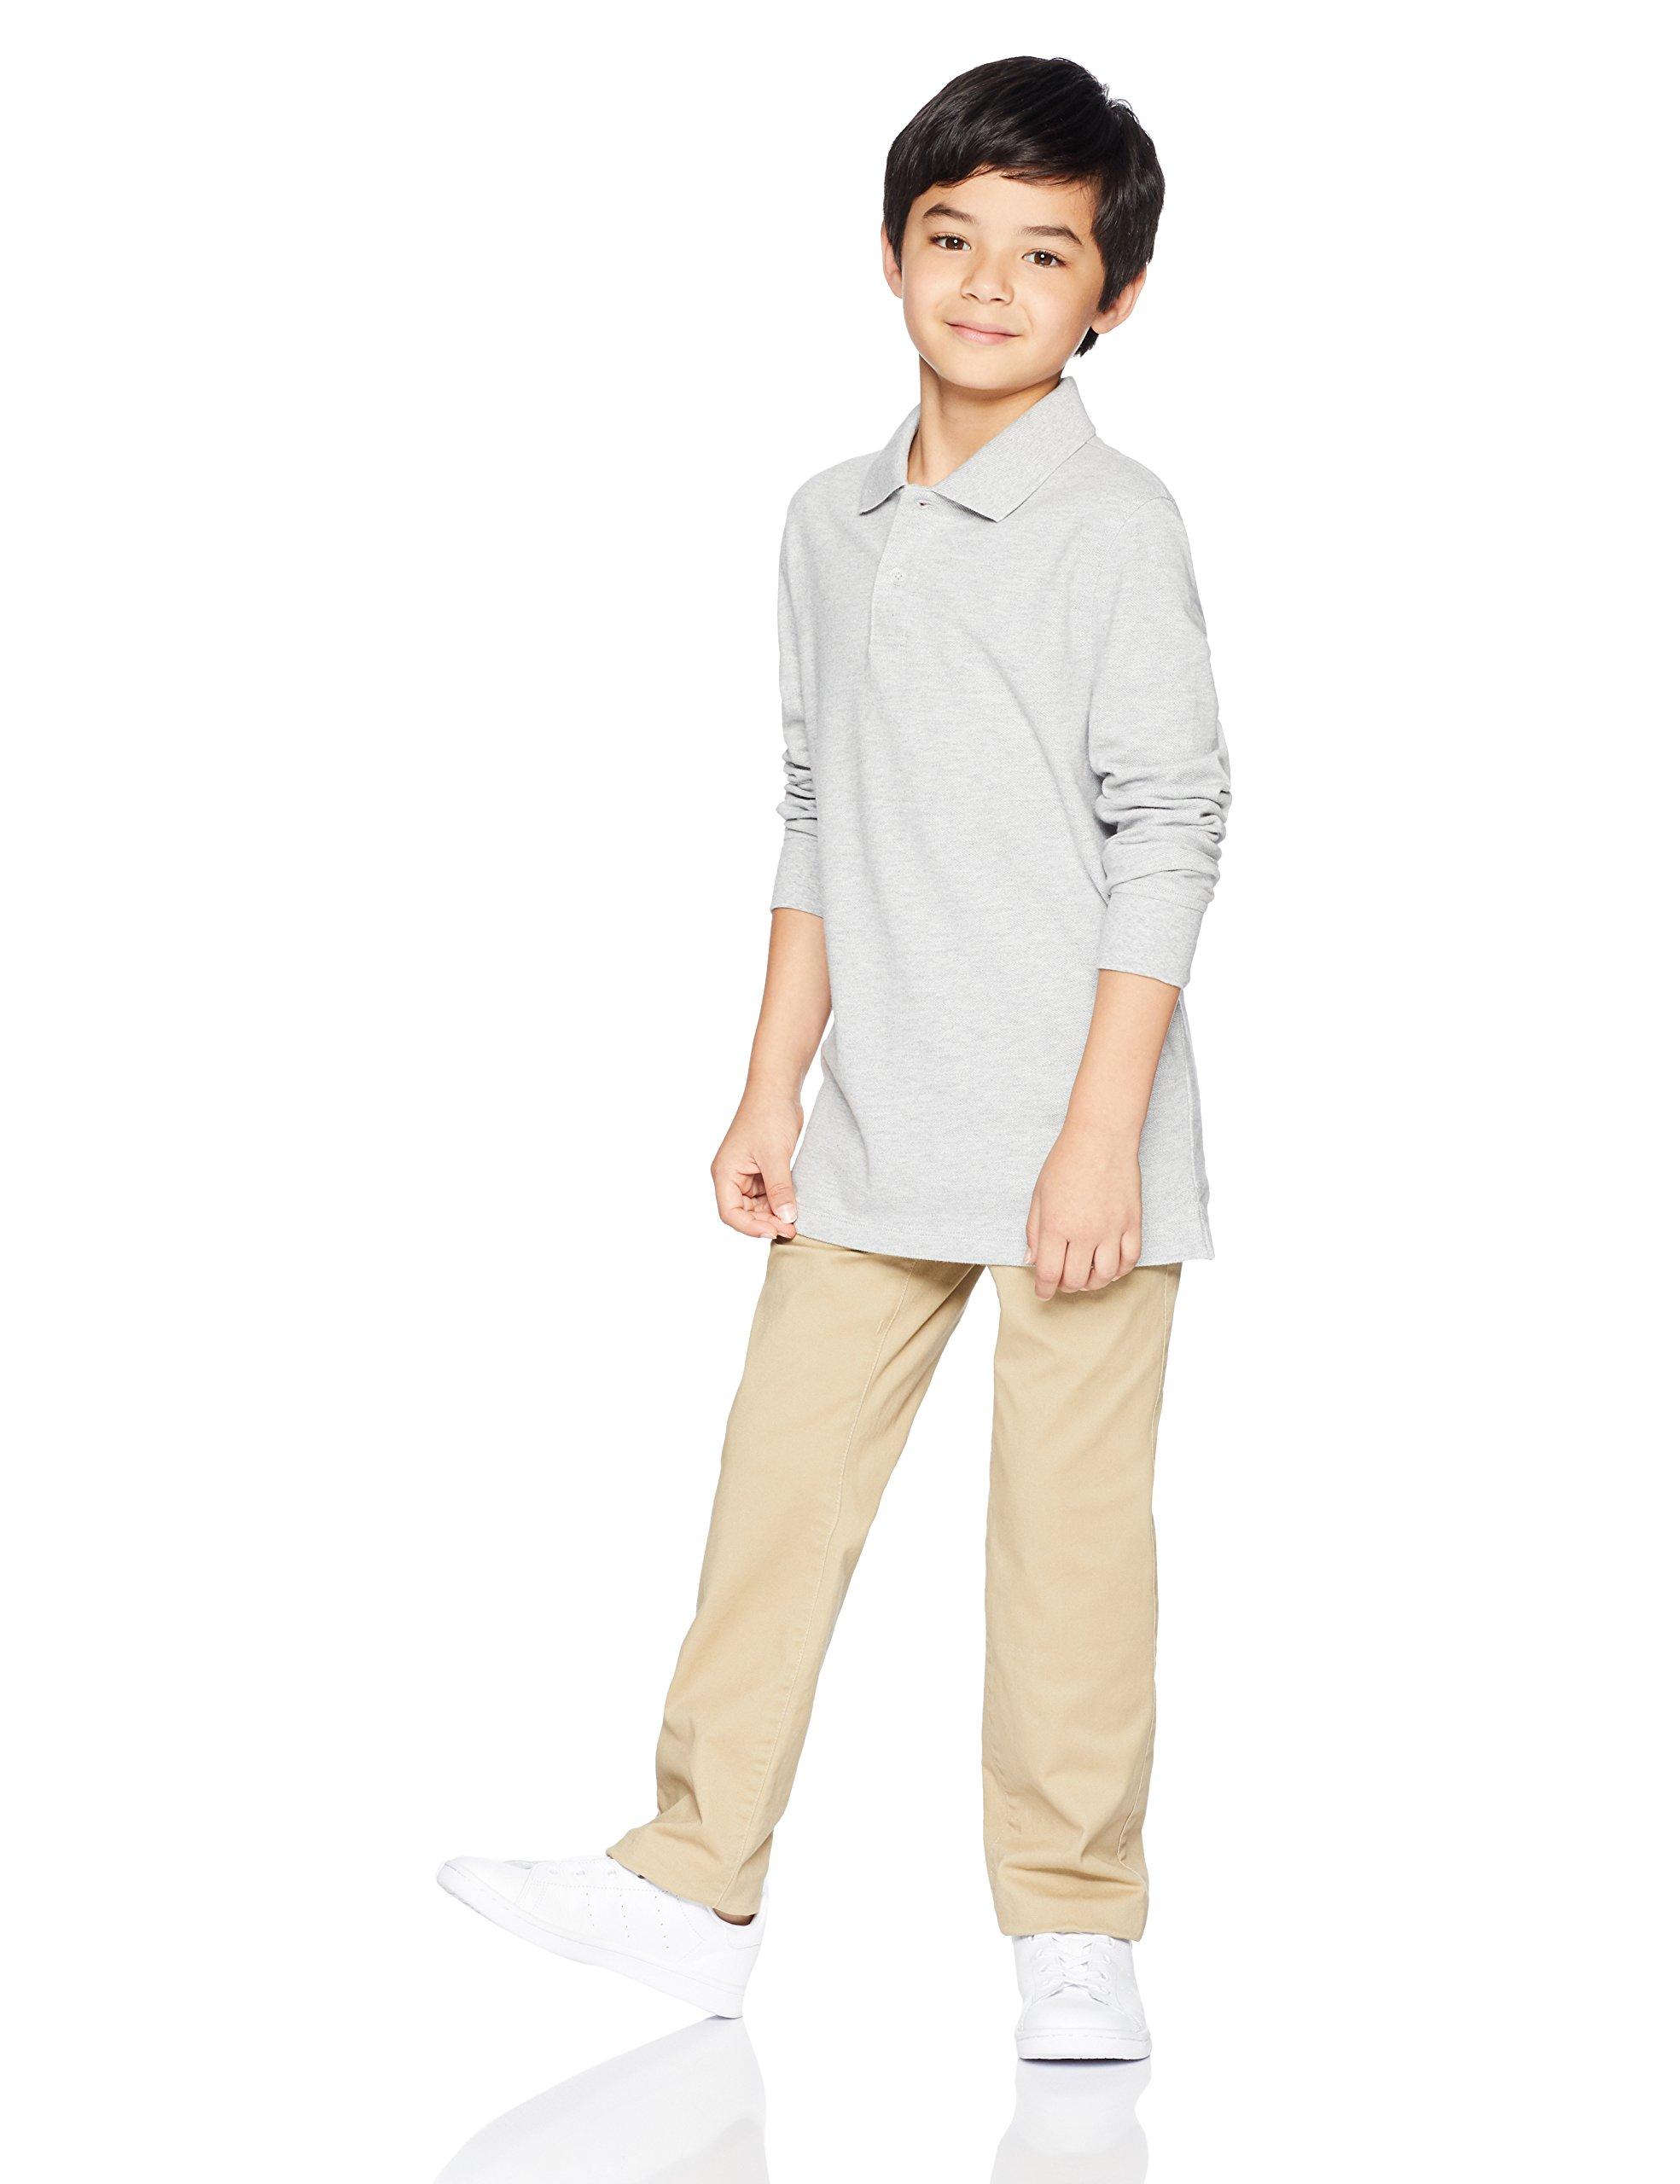 Amazon Essentials Boys' Straight Leg Flat Front Uniform Chino Pant, Khaki,10 by Amazon Essentials (Image #2)